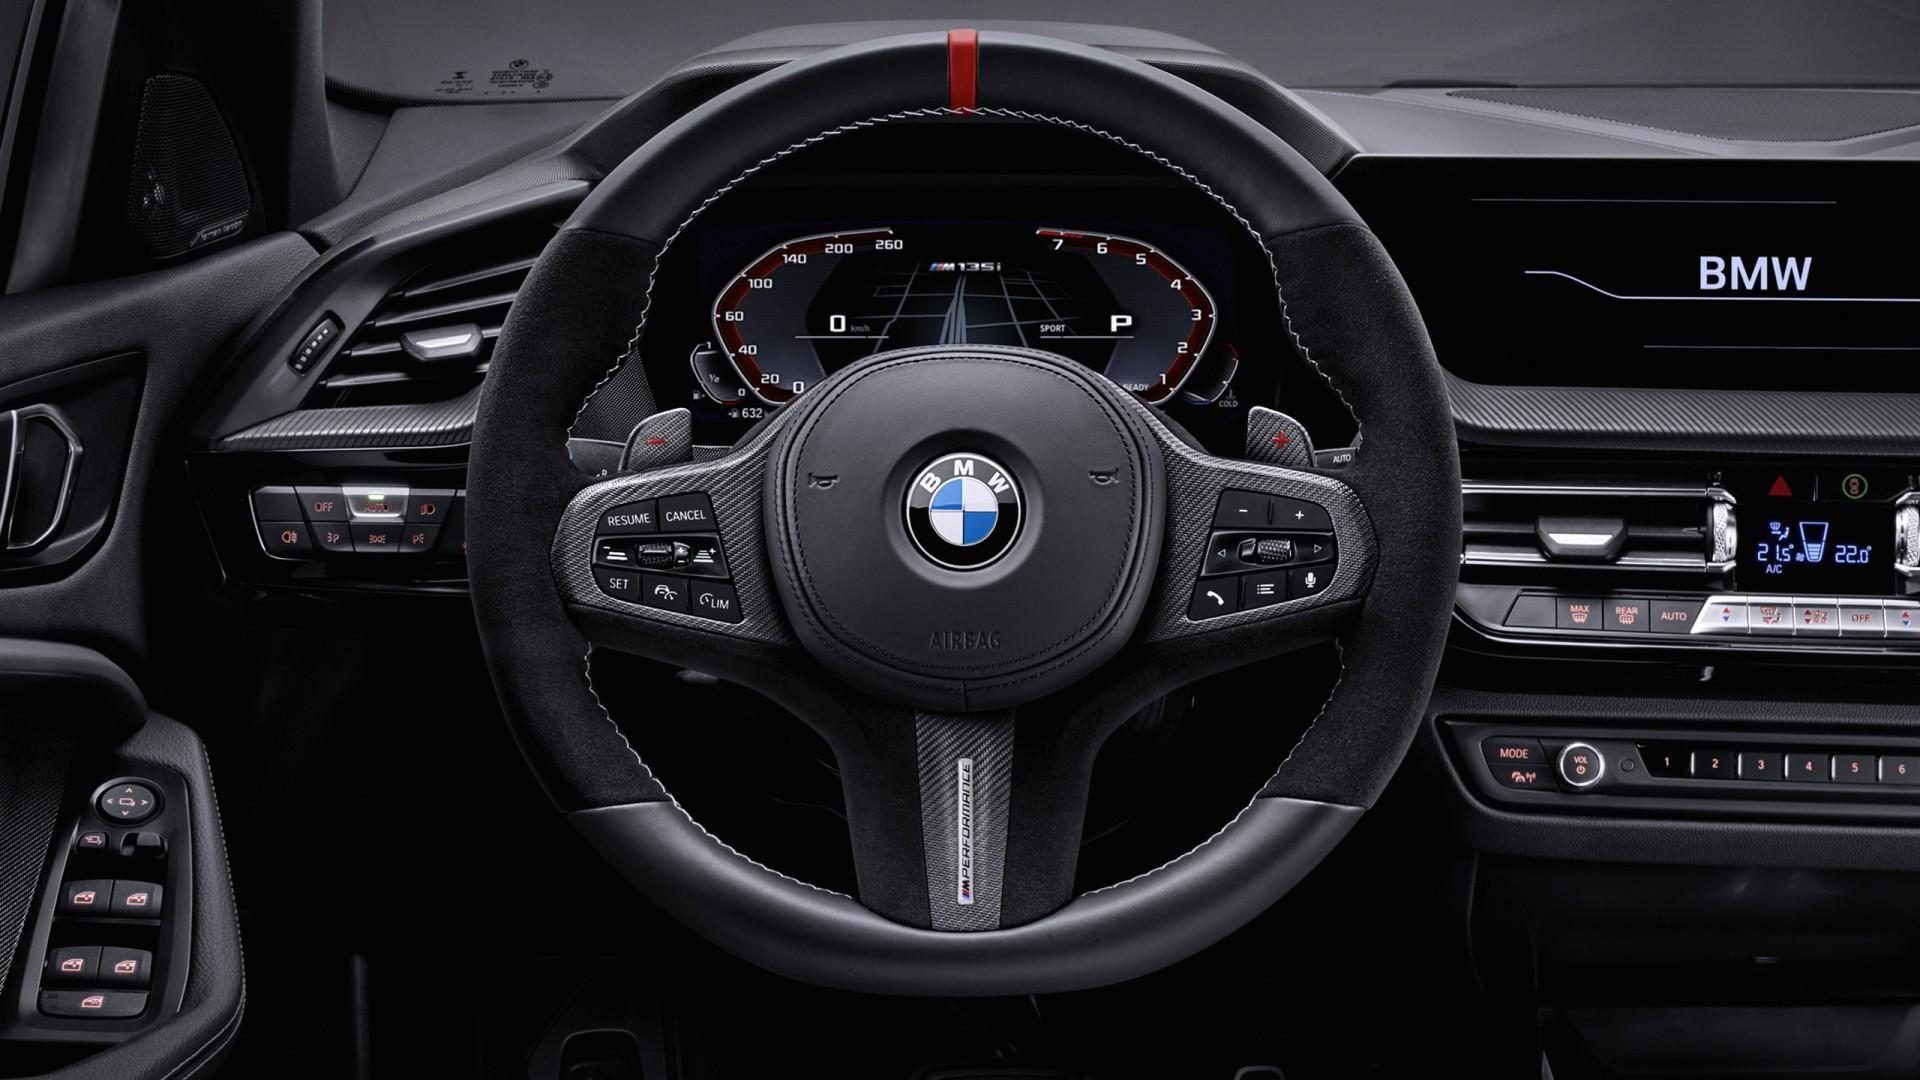 Bmw M135i Xdrive M Performance Parts 2019 4k 2 Wallpaper Hd Car Wallpapers Id 12676